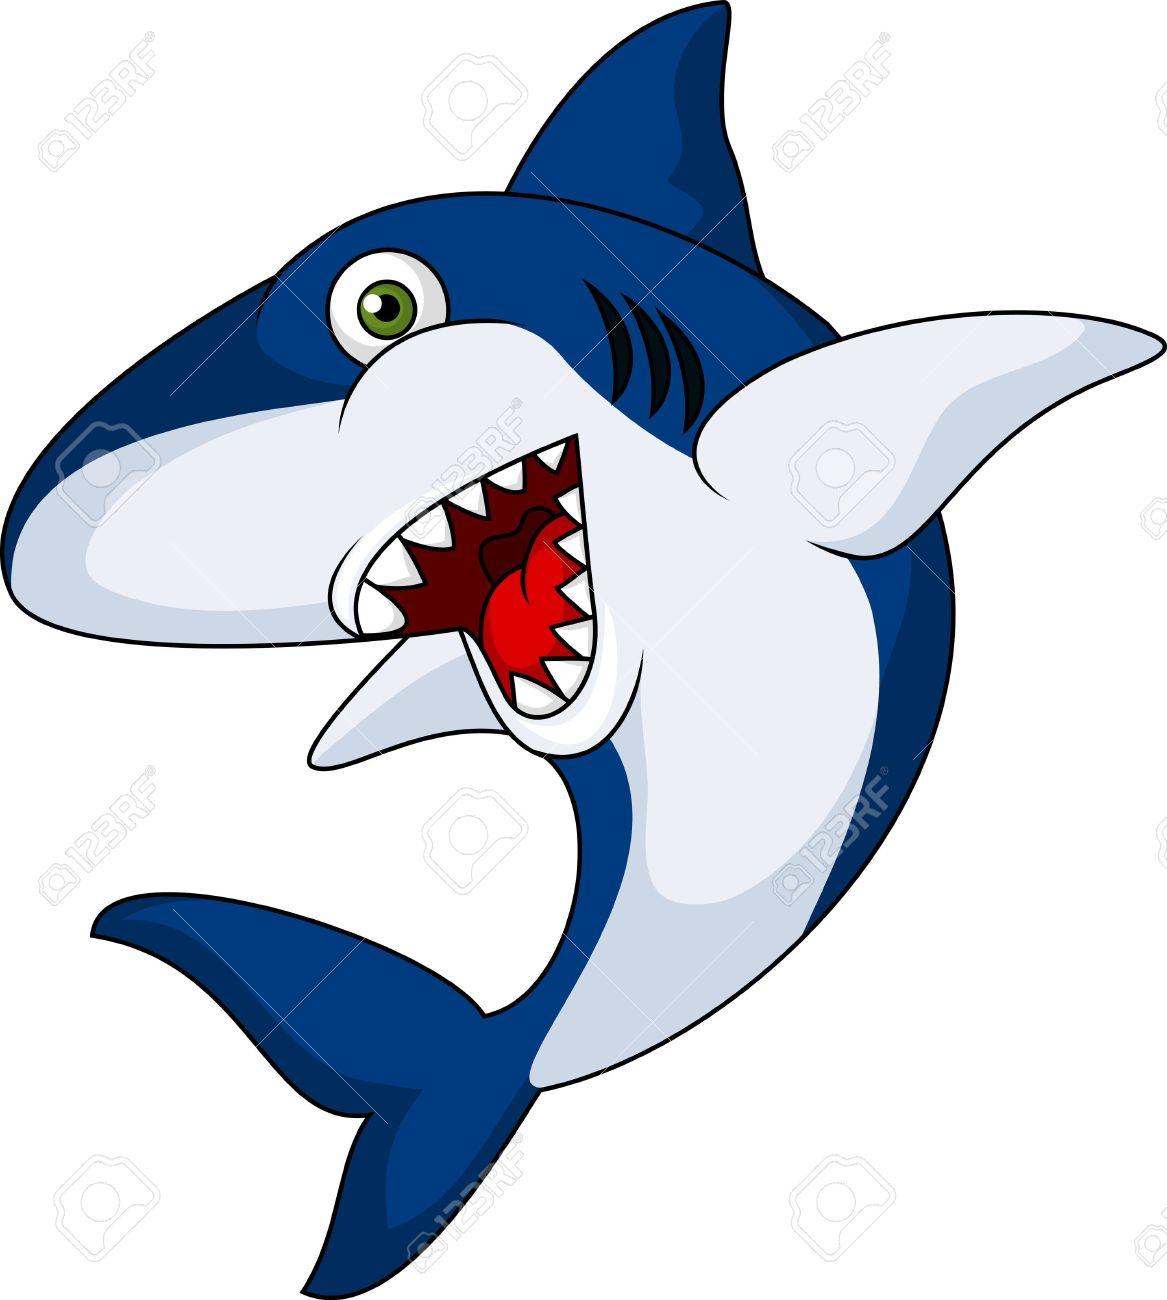 smiling shark cartoon royalty free cliparts vectors and stock rh 123rf com Shark Silhouette Clip Art Funny Shark Clip Art